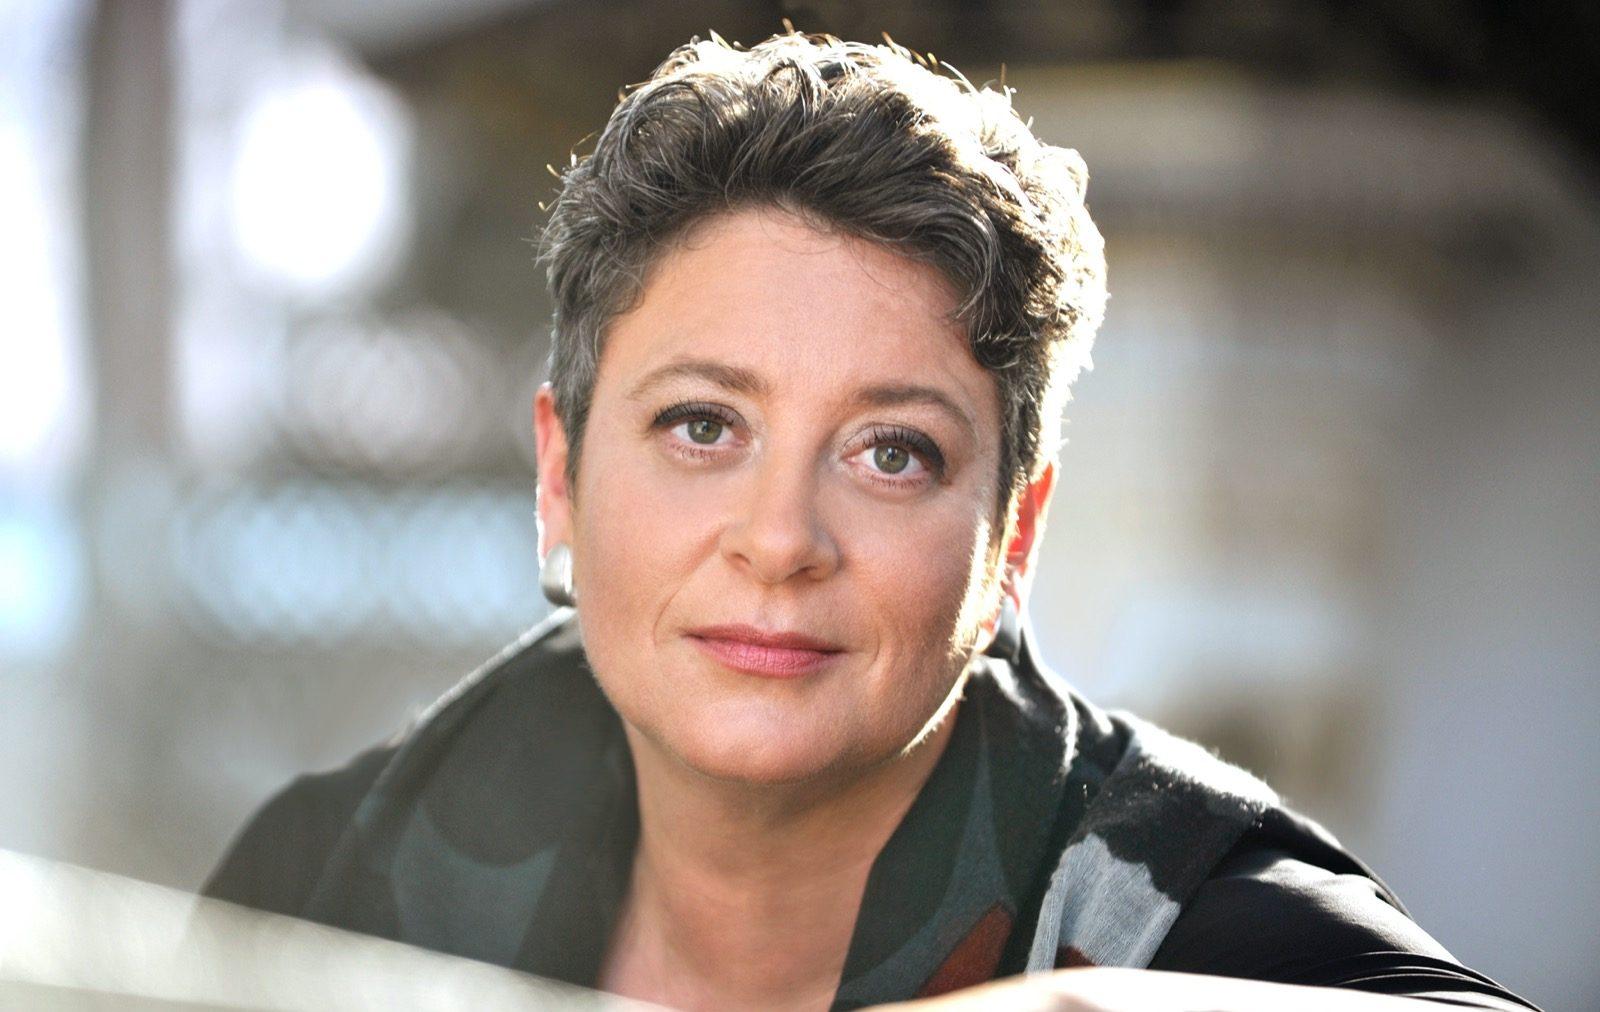 Gerhild Romberger